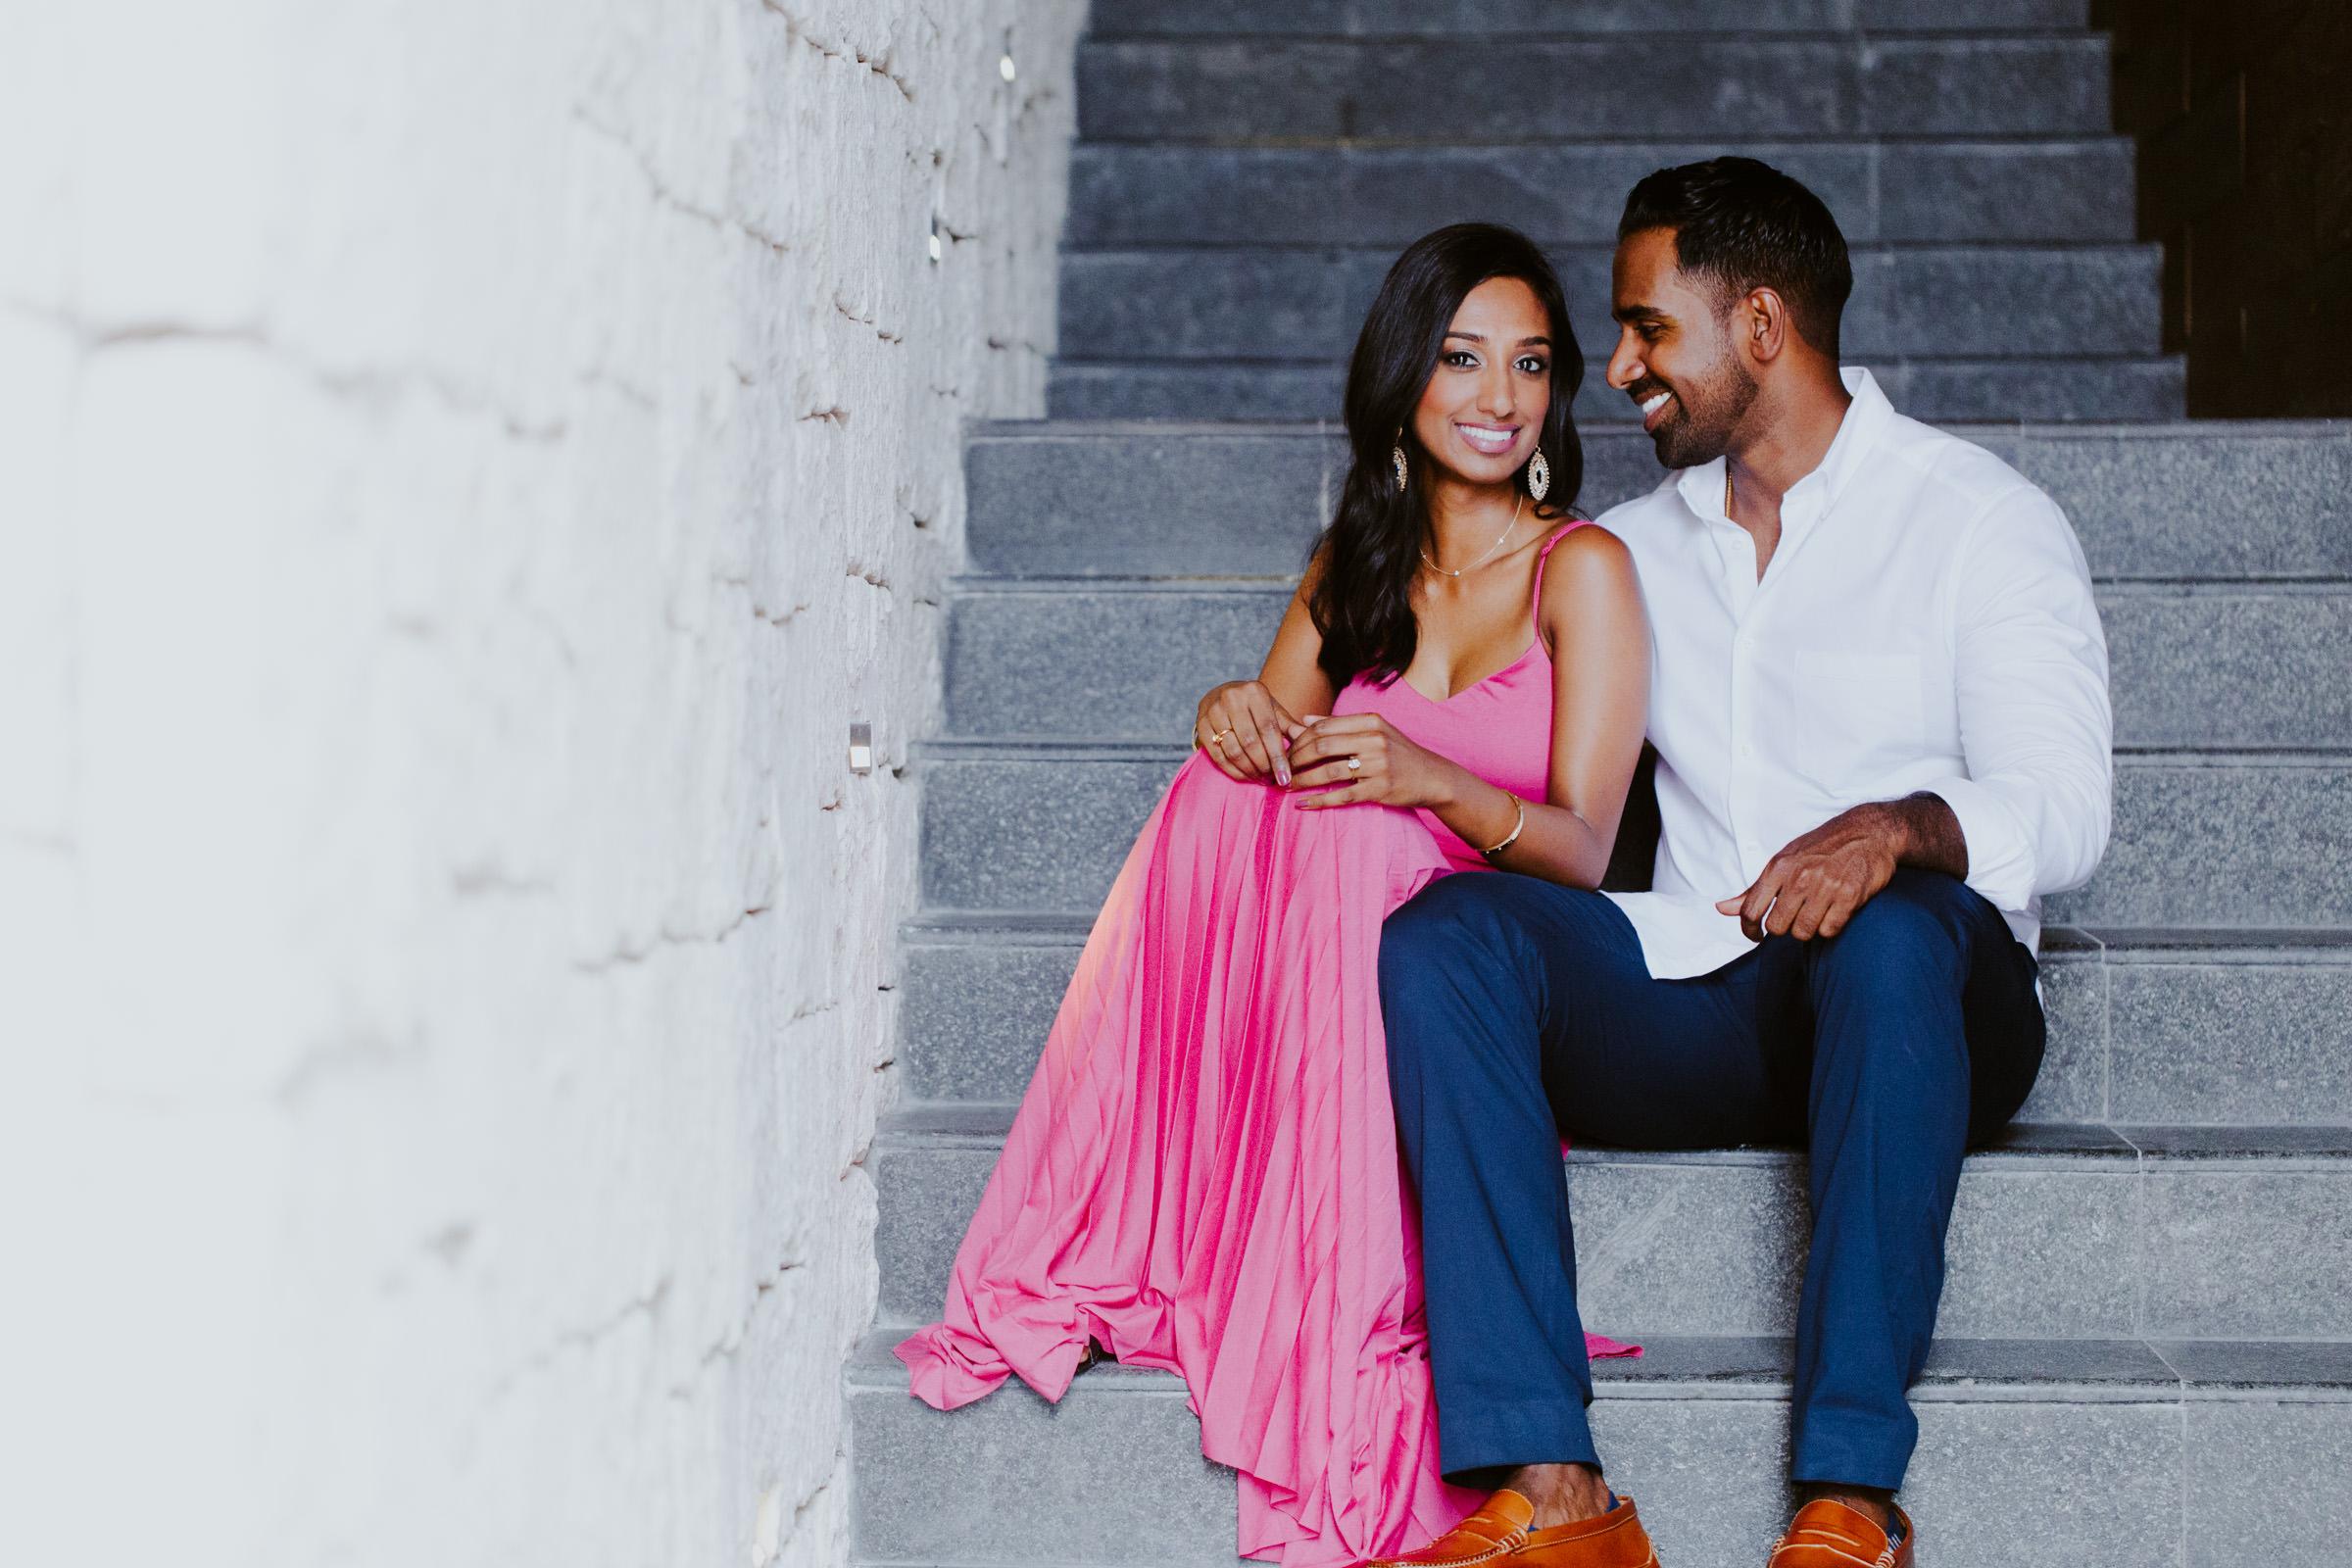 Engagement-Session-Nizuc-Resort-Spa-Indian-Wedding-Cancun-Mexico-Pierce--3.jpg